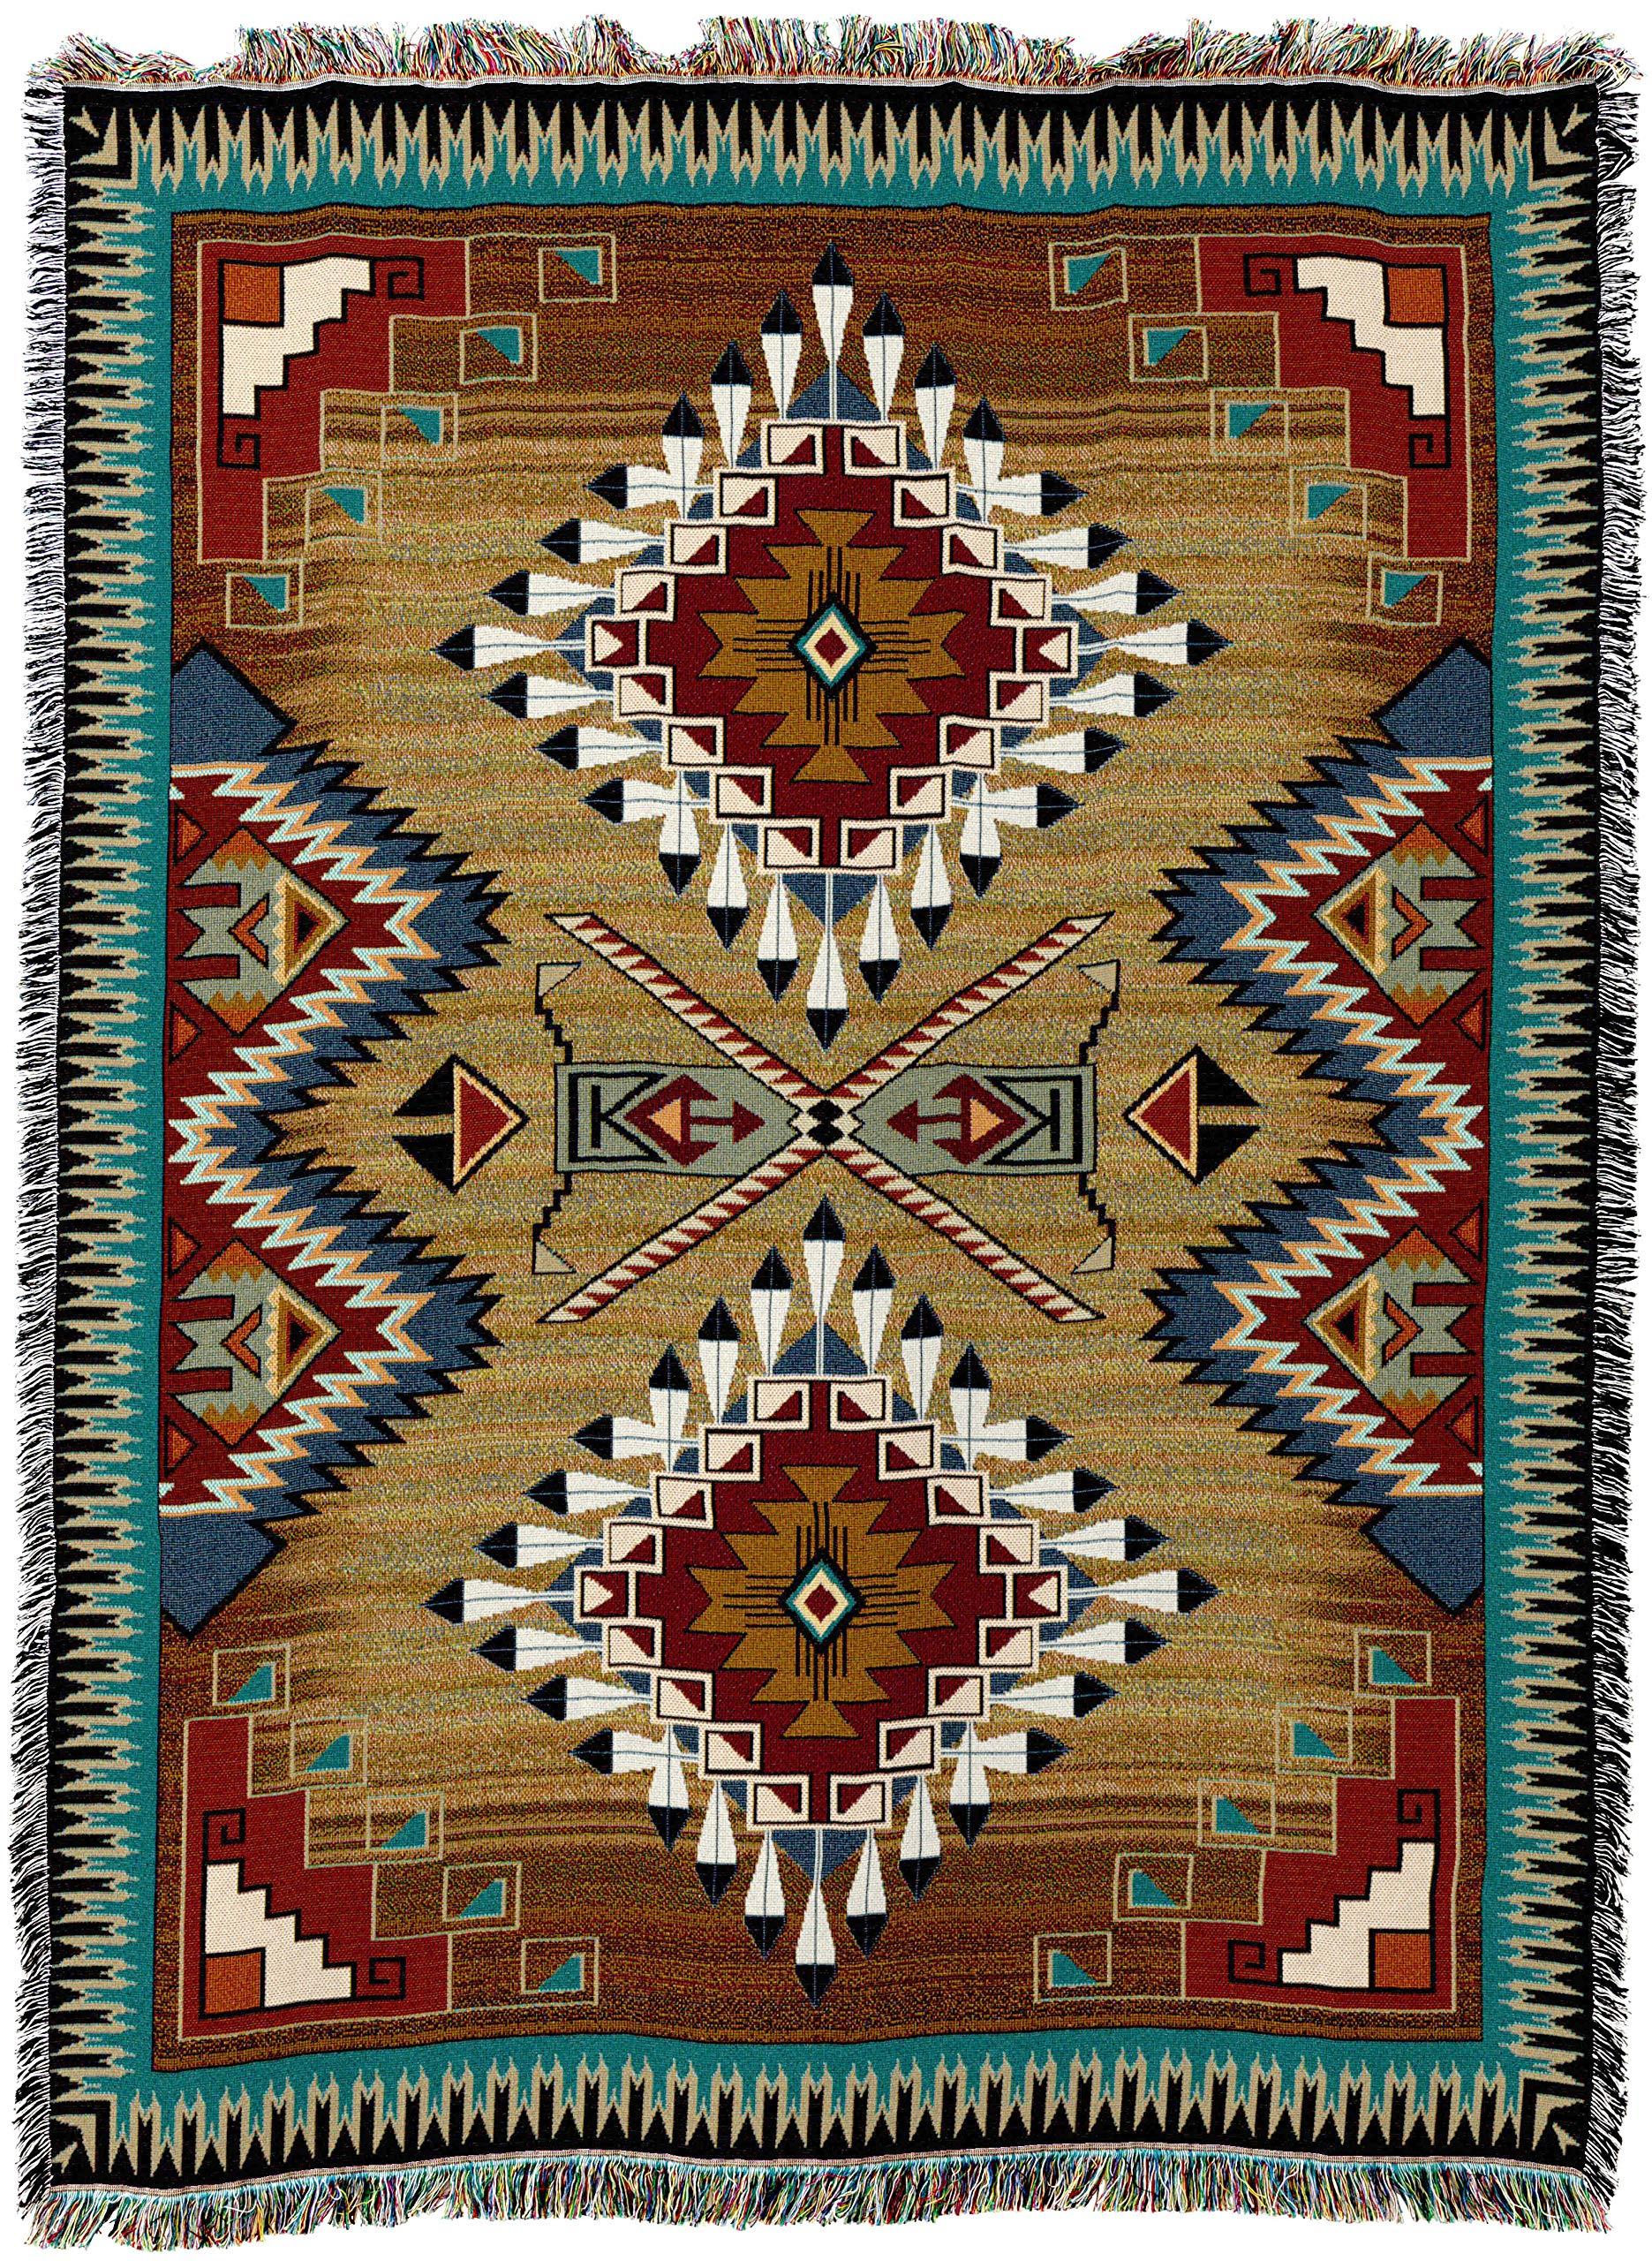 Native American Indian Patterns Free Patterns